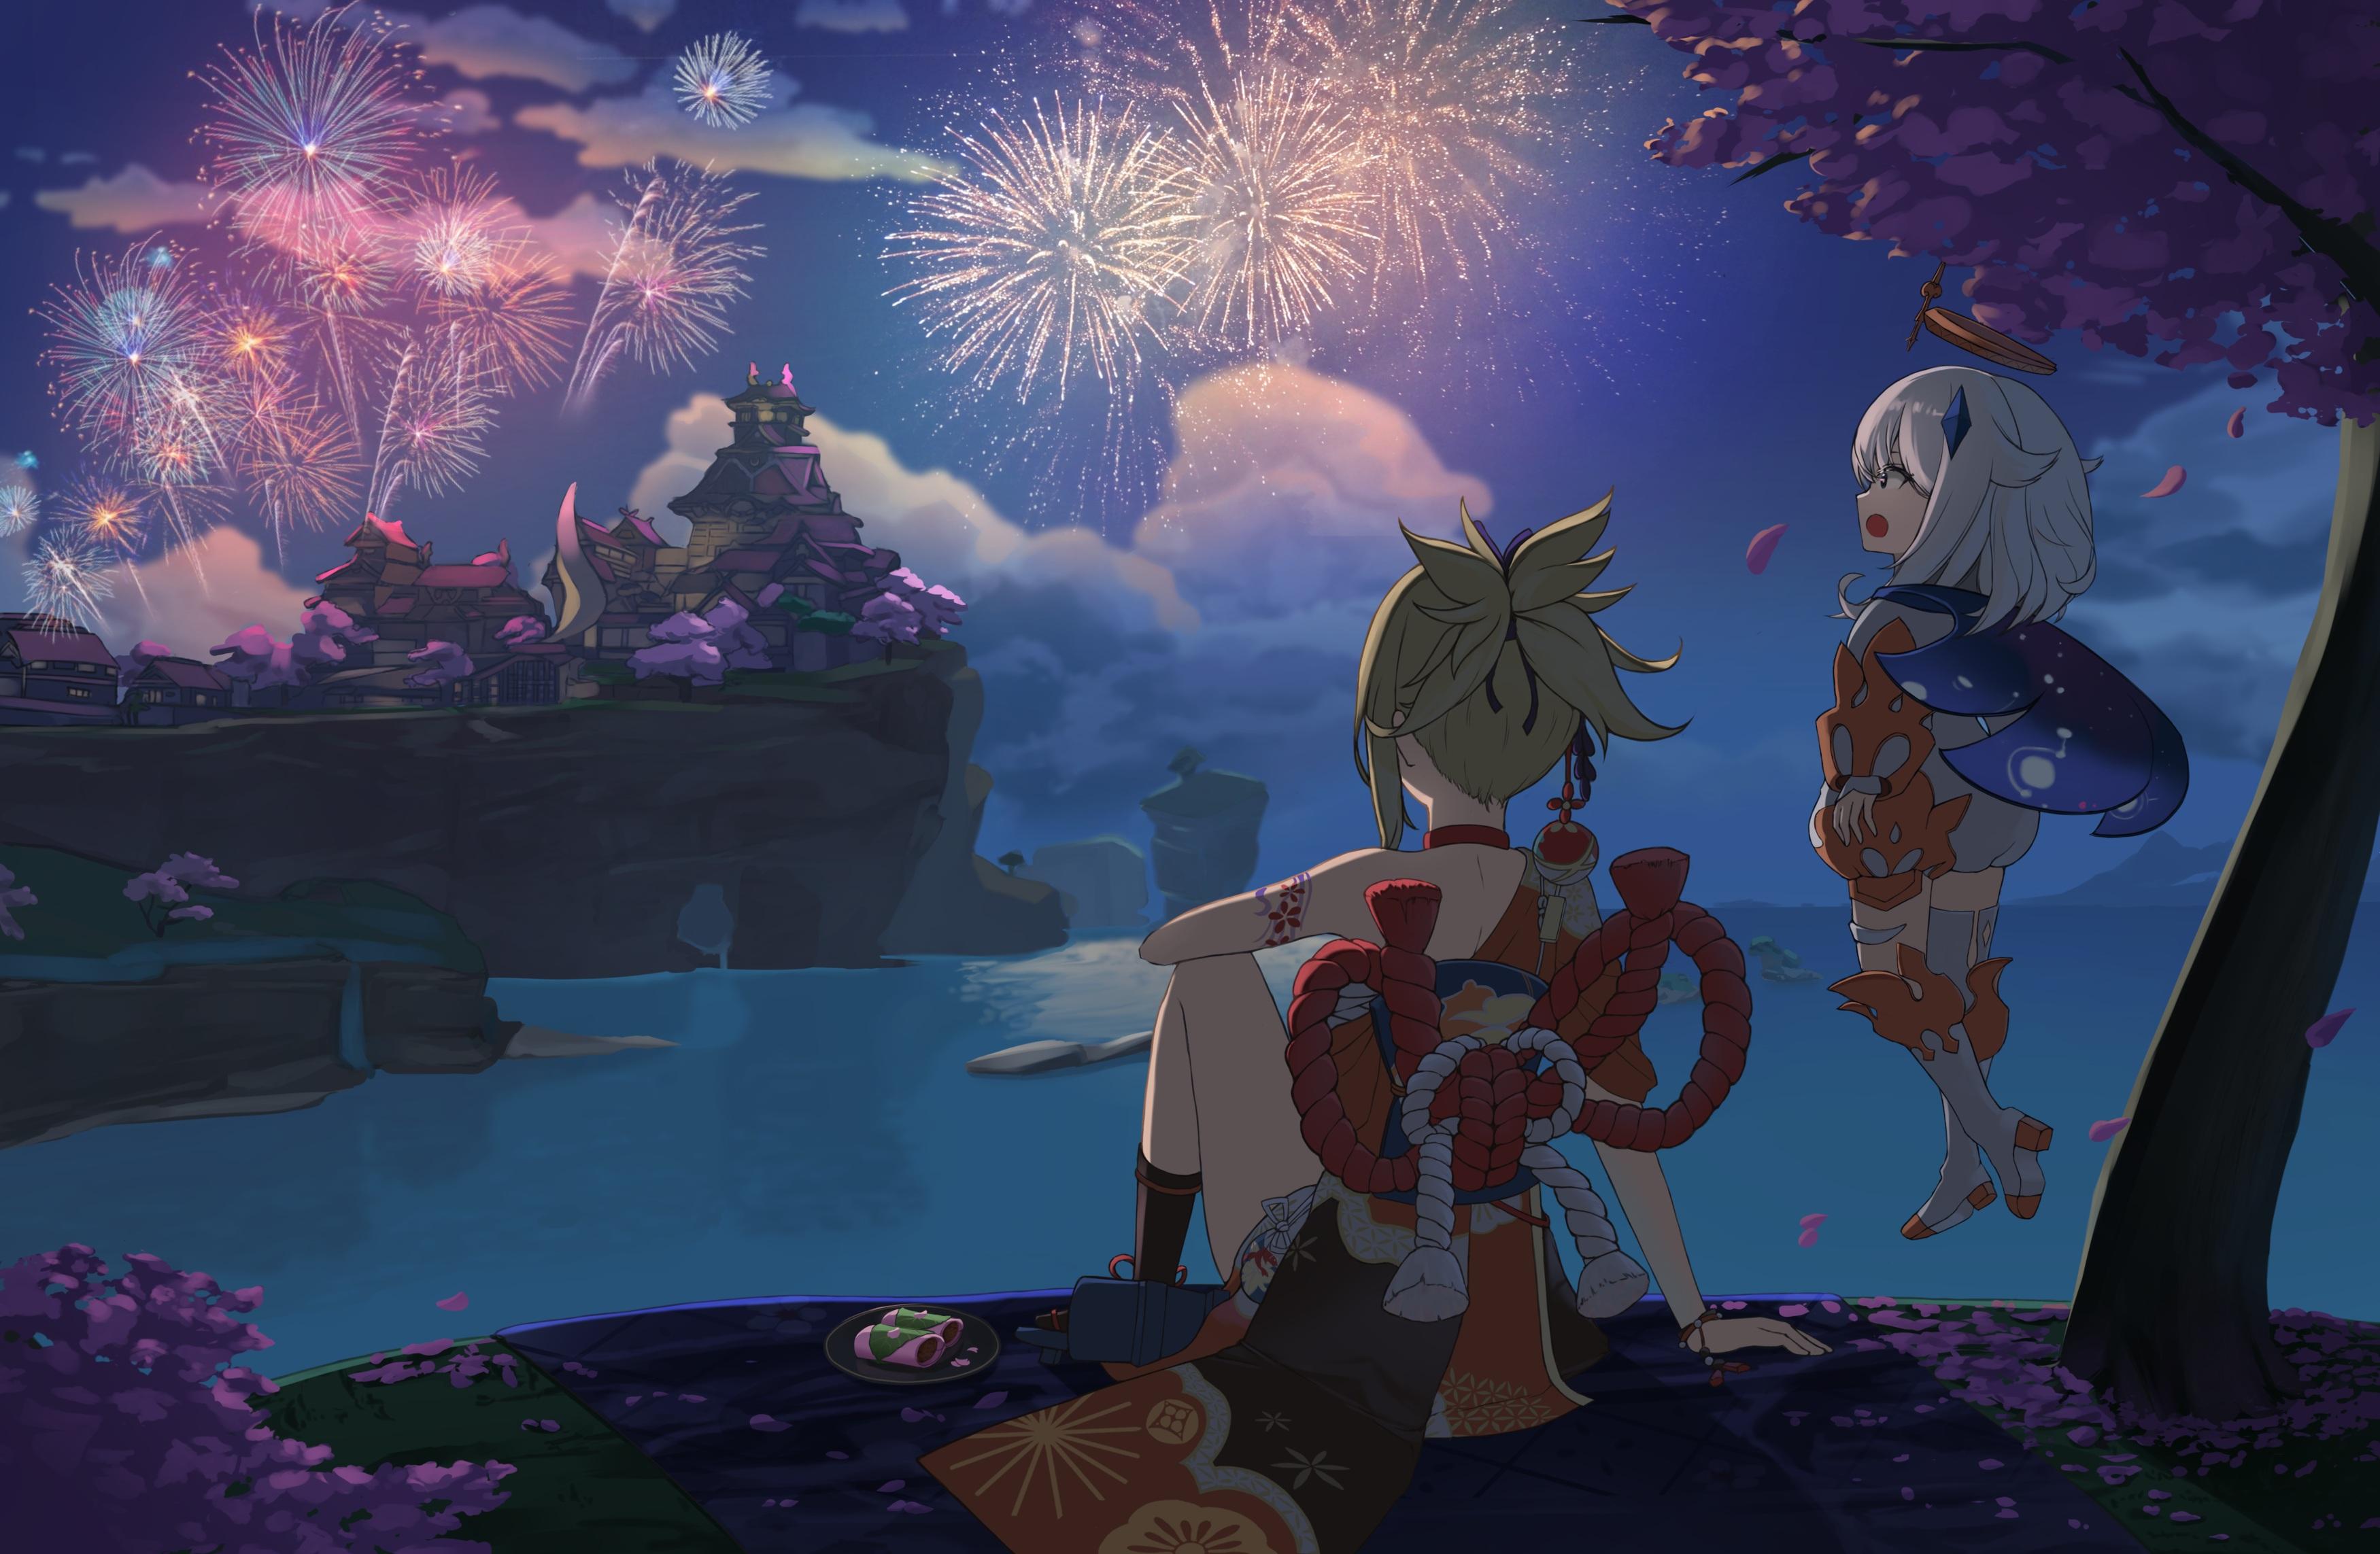 Anime Anime Girls Genshin Impact Fireworks 3500x2286